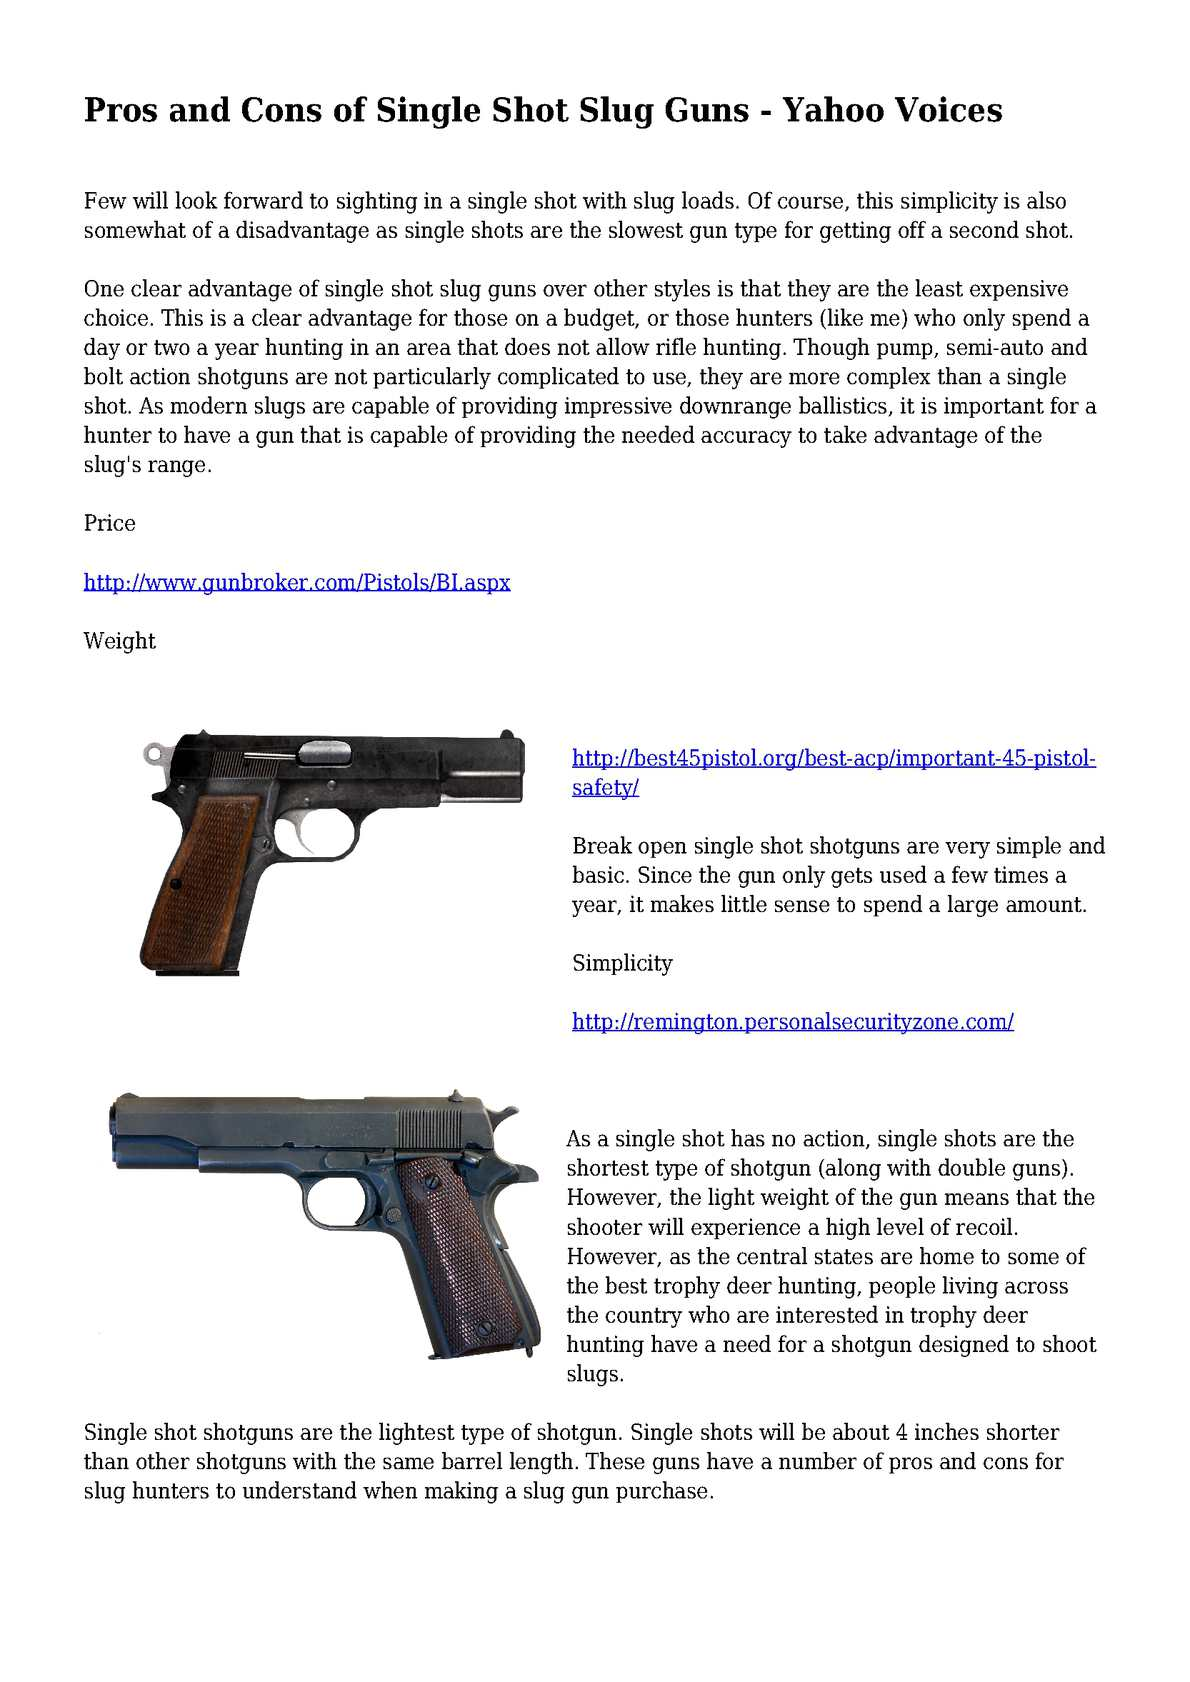 Calaméo - Pros and Cons of Single Shot Slug Guns - Yahoo Voices